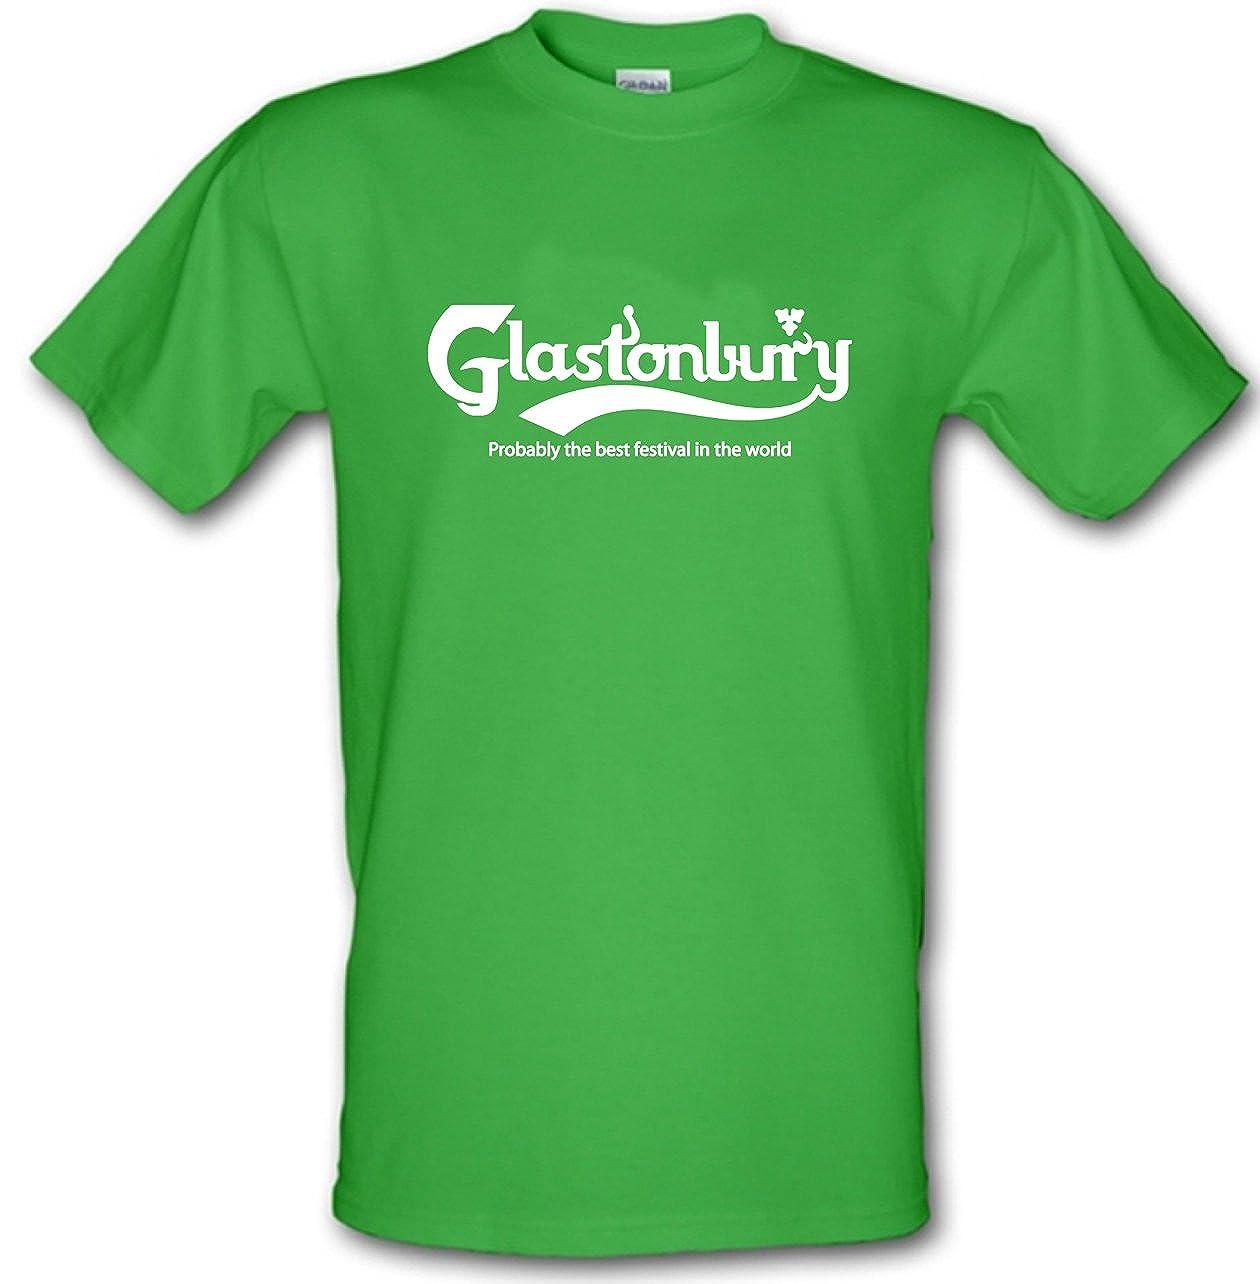 b8652baec Glastonbury Probably The Best Festival T-Shirt in The World Music Festival  Heavy Cotton t-Shirt Colours: Amazon.co.uk: Clothing